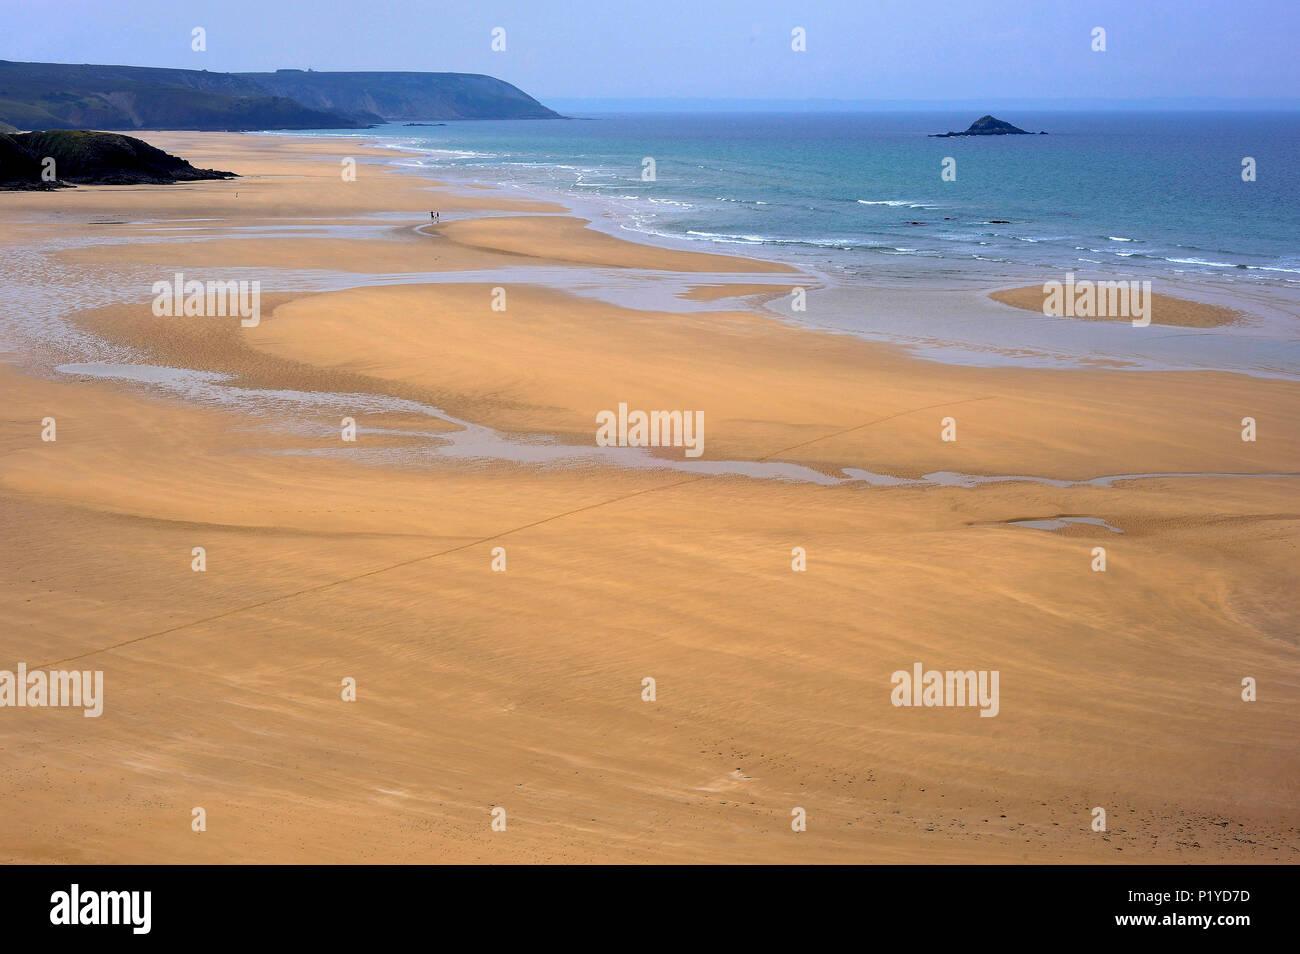 France, Brittany, Finistere, Beach between the Pointe de Dinan and the Cap de la Chevre, Crozon Peninsula - Stock Image